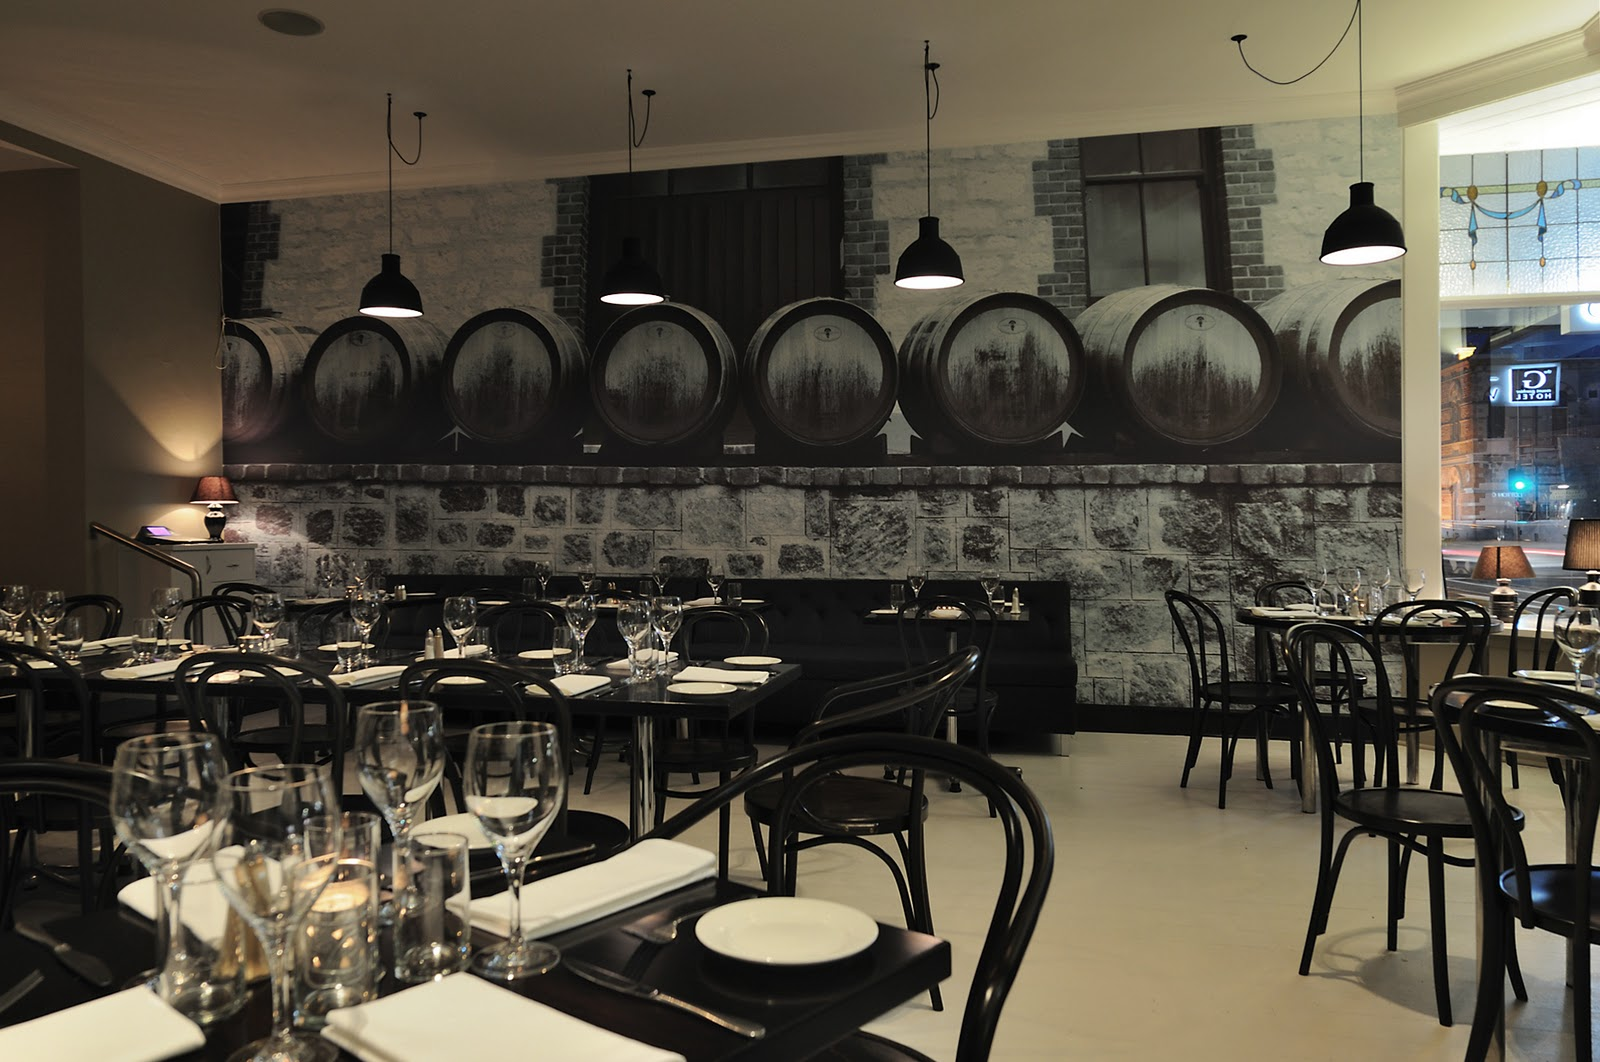 Funky Wine Bar Interior Design Gift - Home Design Ideas and ...